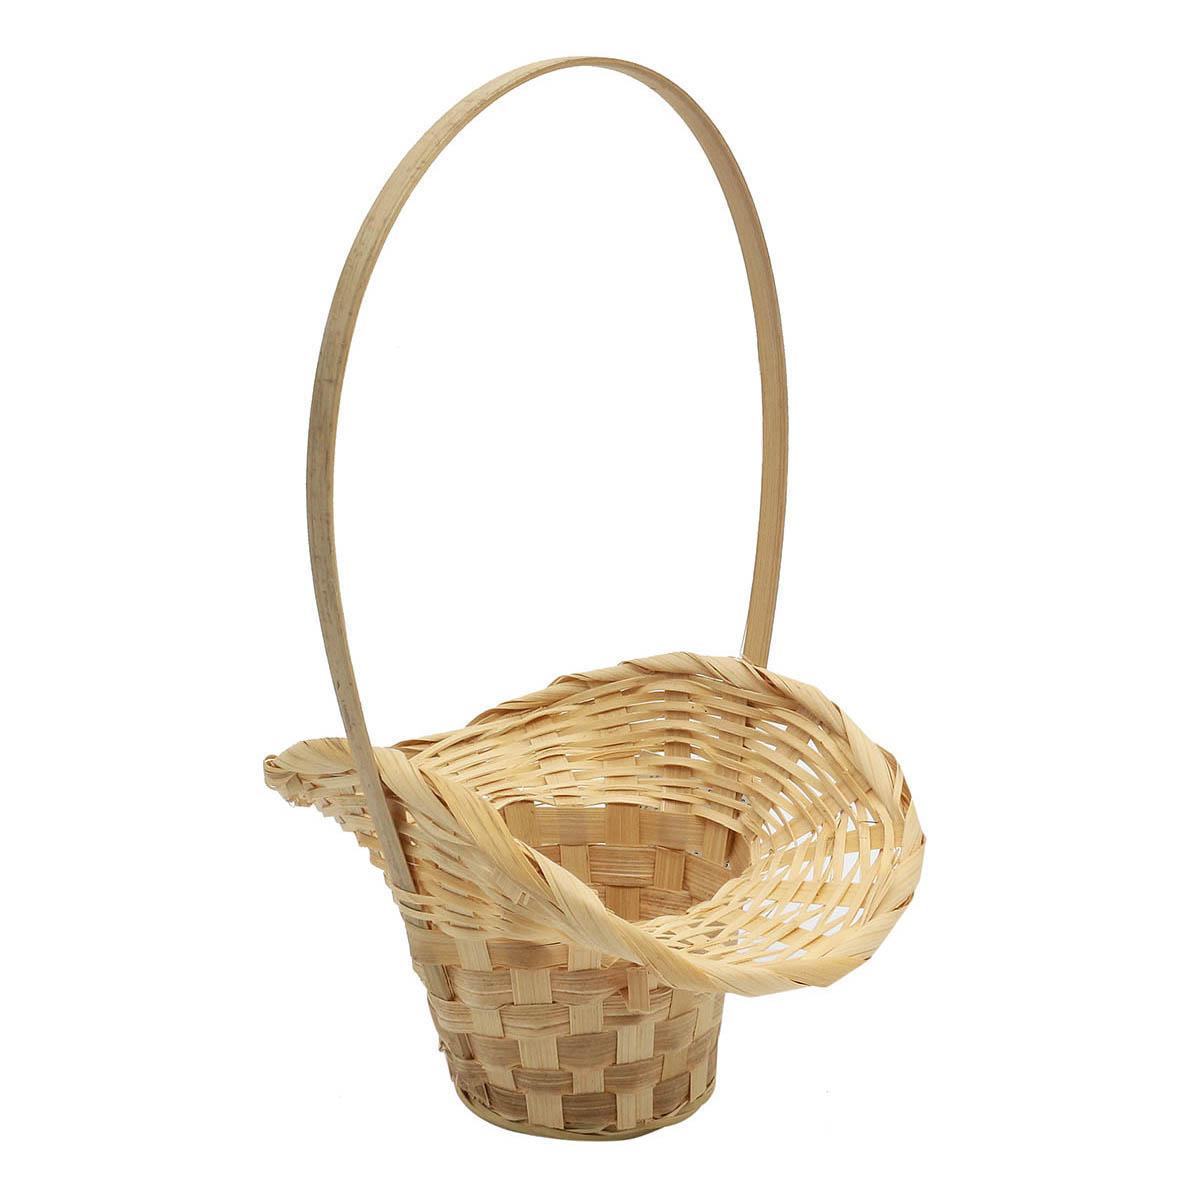 19HJ19079 Корзина плетеная бамбук 'S' 20,5*9*Н30,5см, цв. натуральный Астра